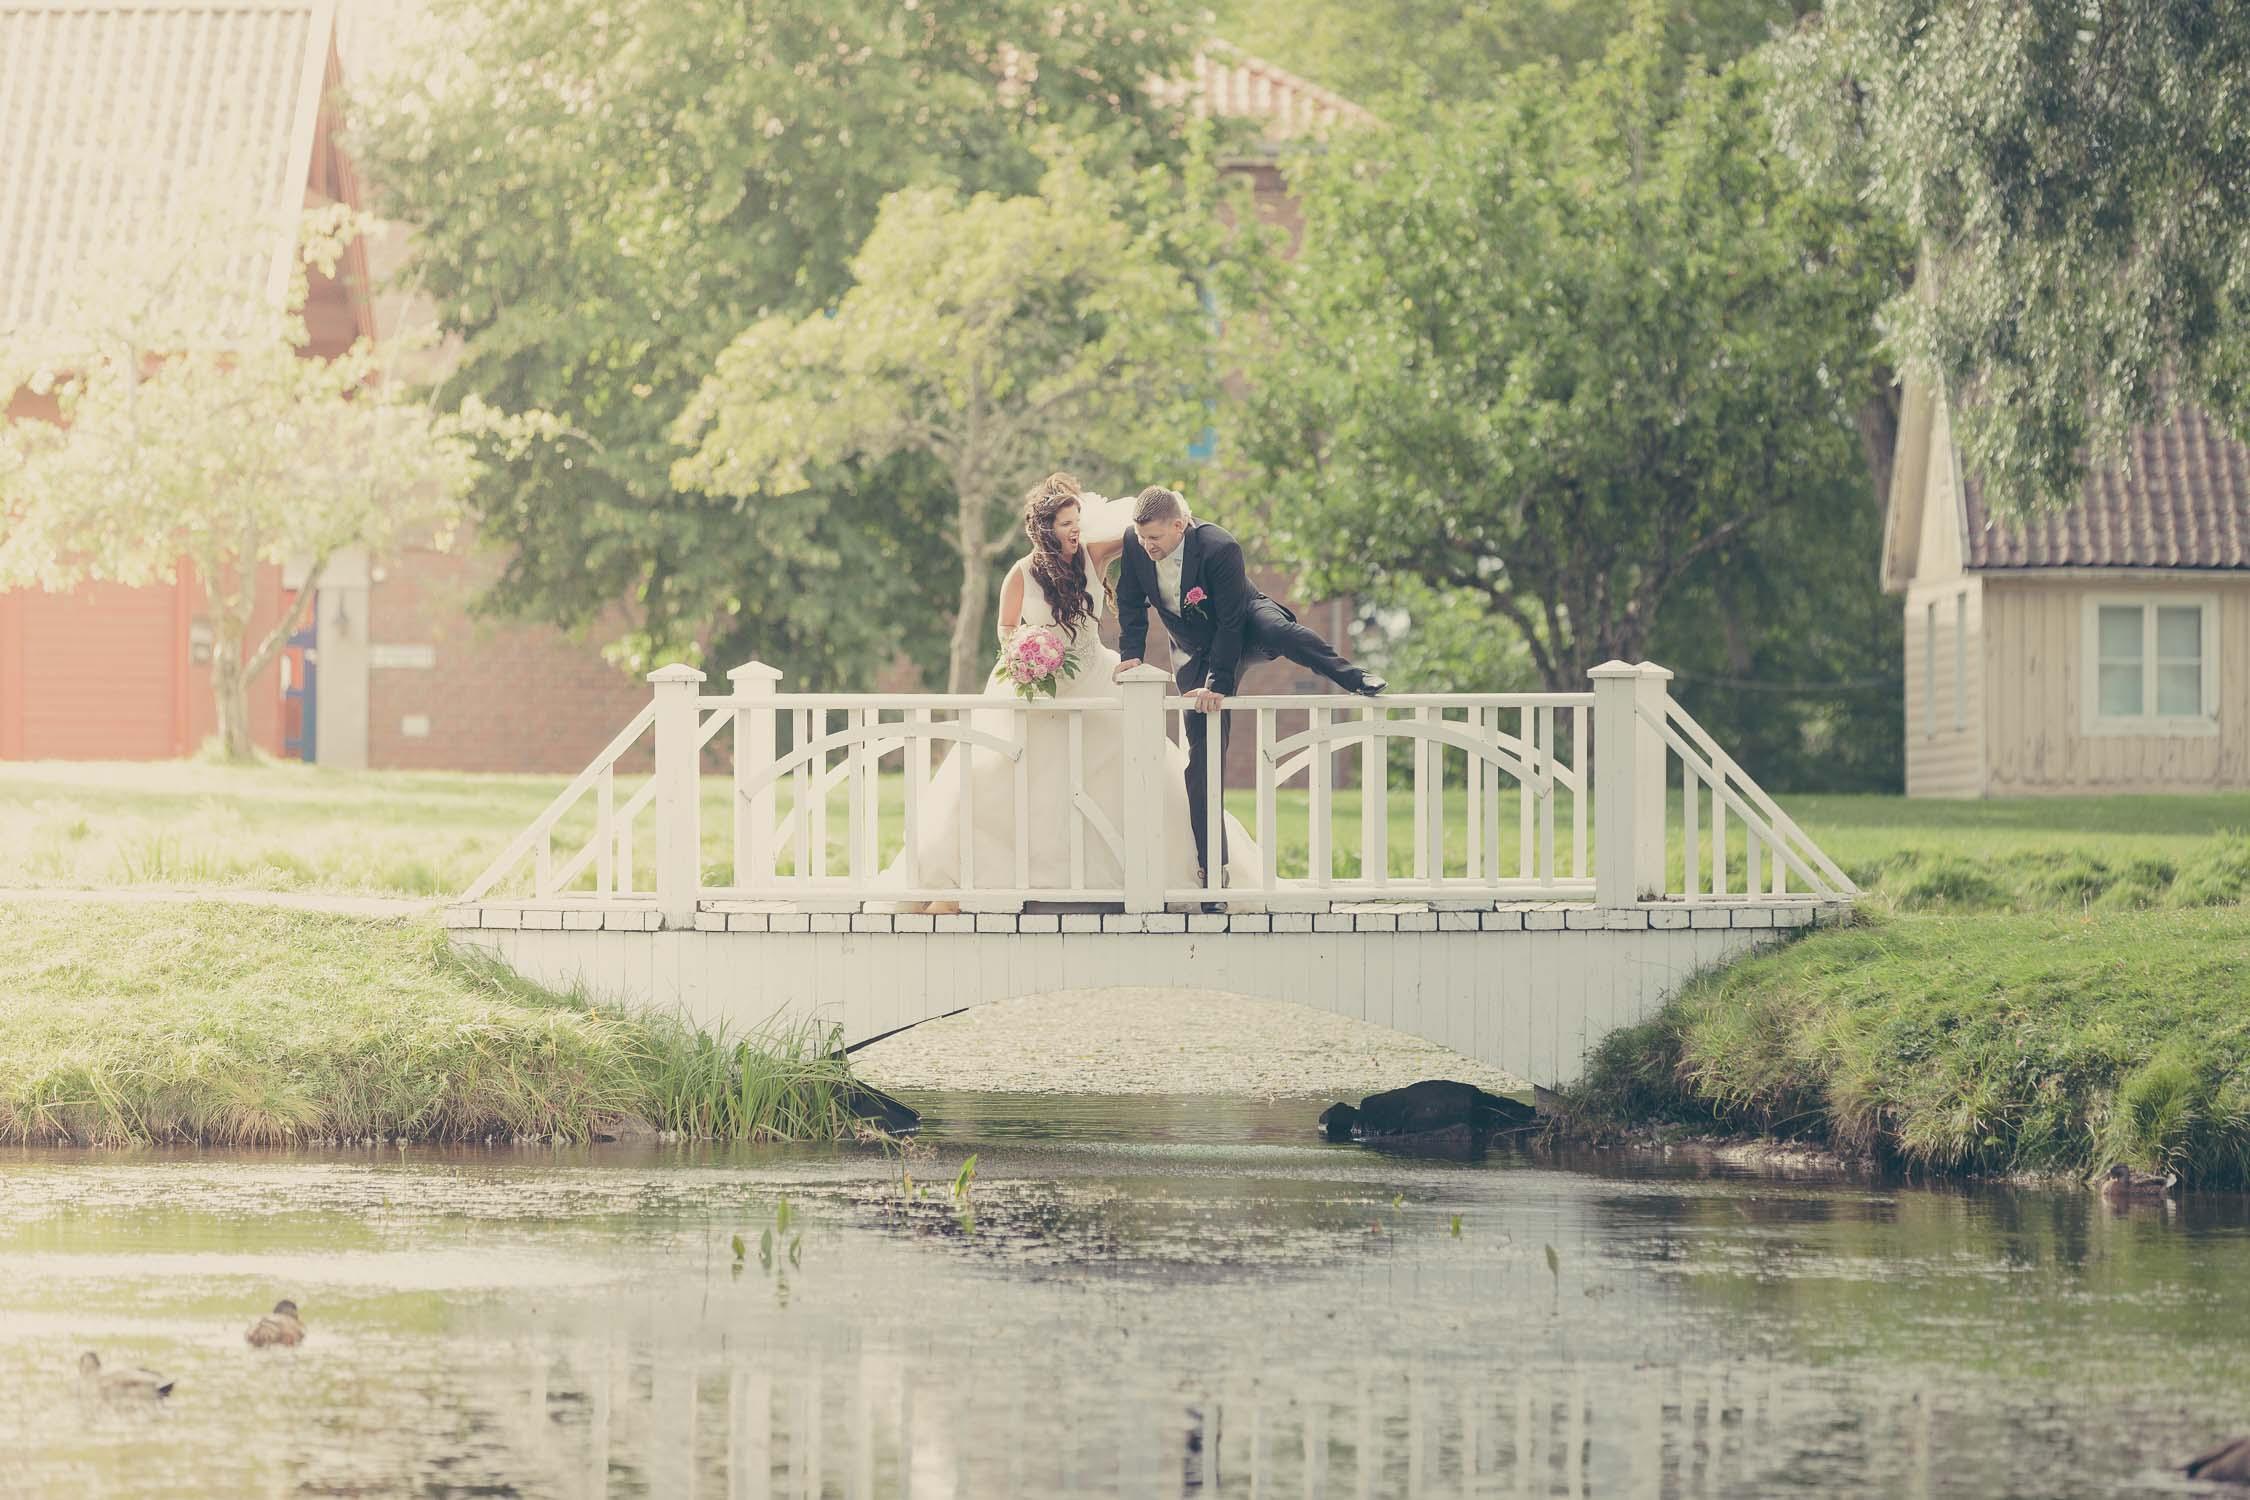 bryllup-bryllupsfotografering-bryllupsfotograf-sarpsborg-20150829-_MG_3328untitled.jpg